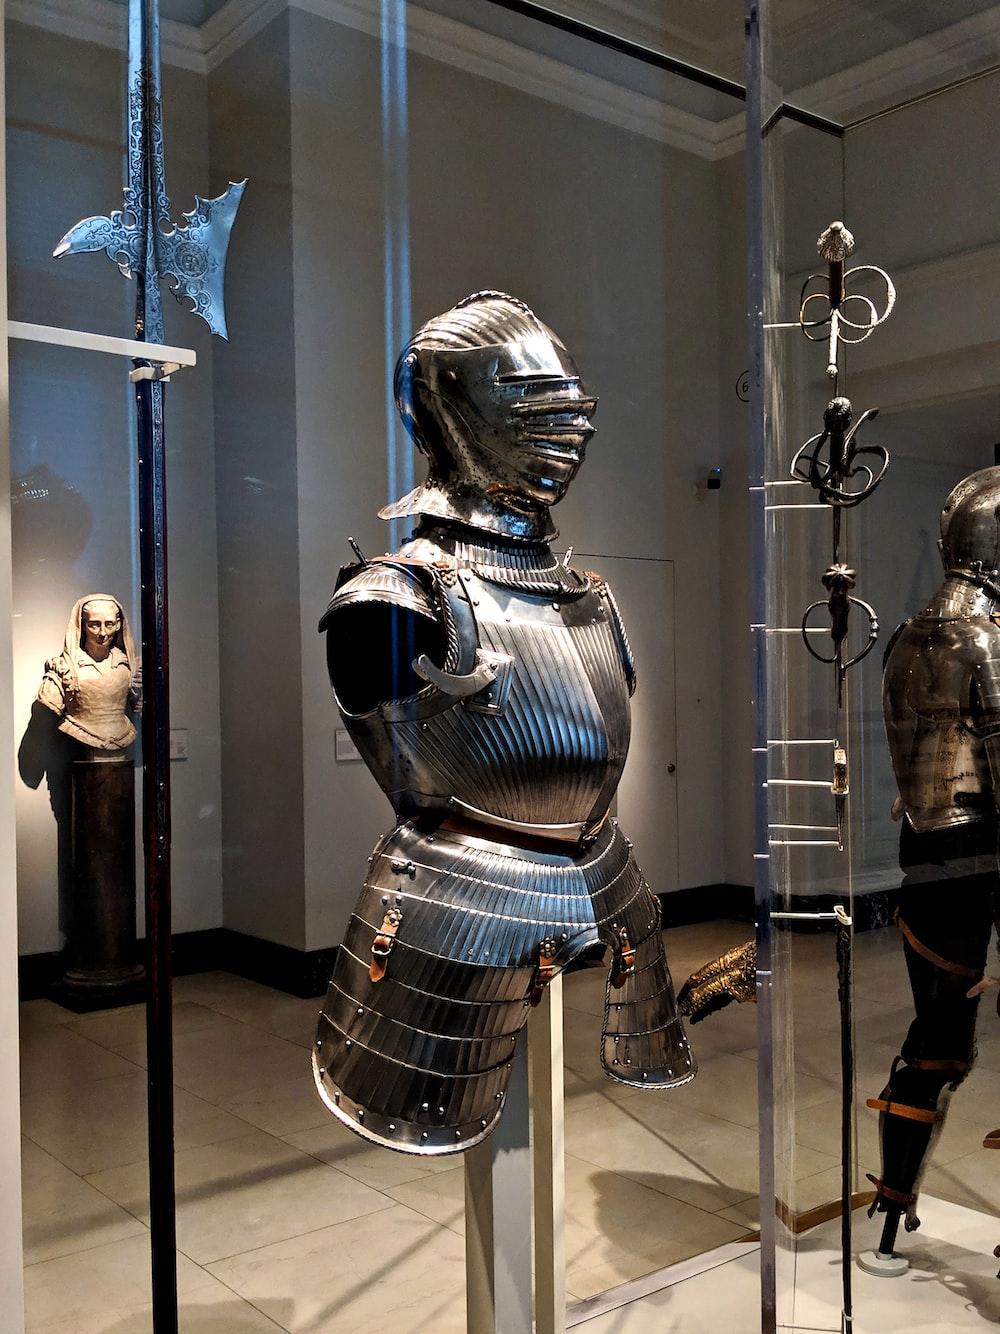 gray plate armor decor